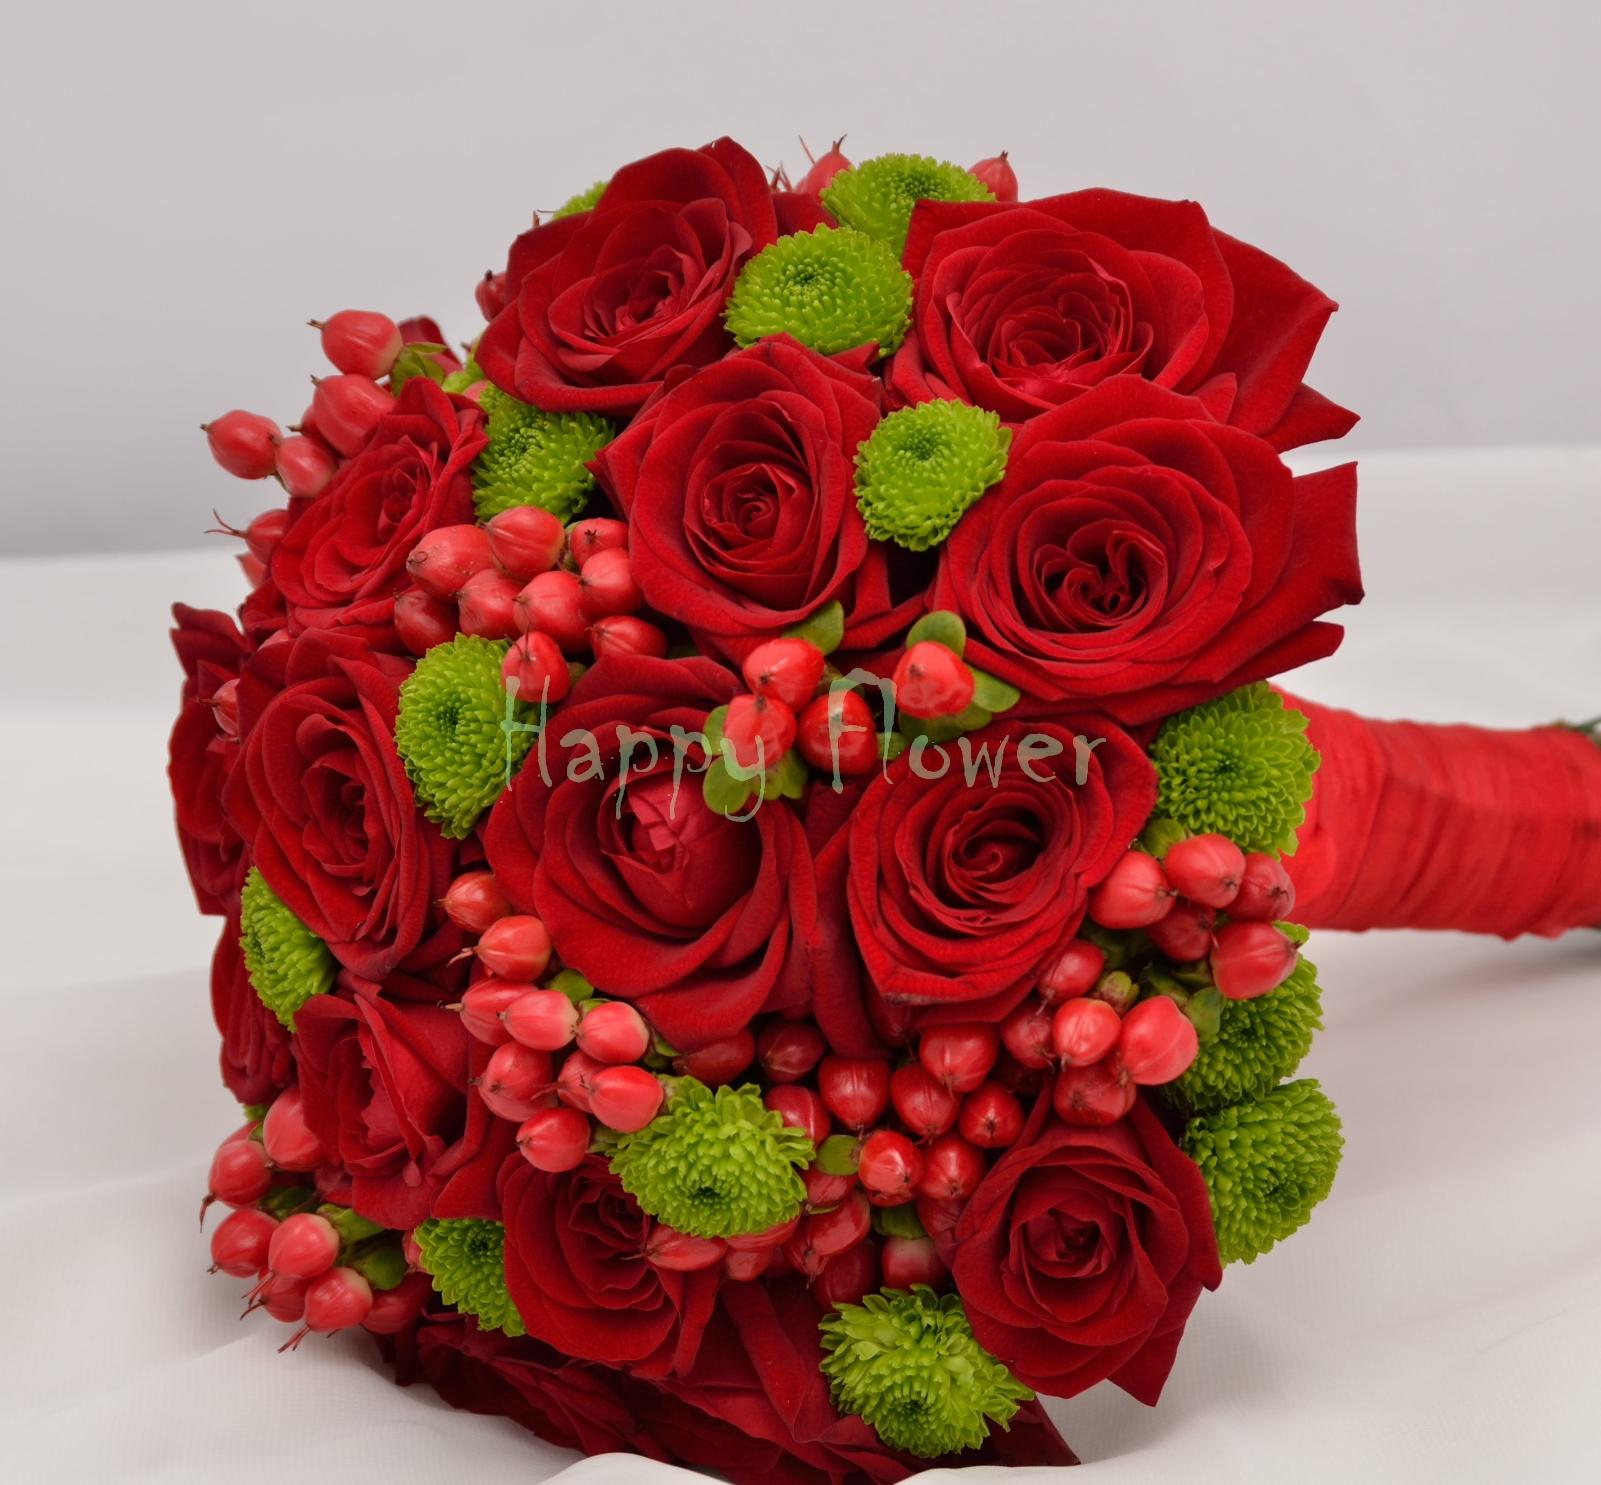 Buchet De Mireasa Nasa Cu Trandafiri Rosii Si Hypericum Rosu